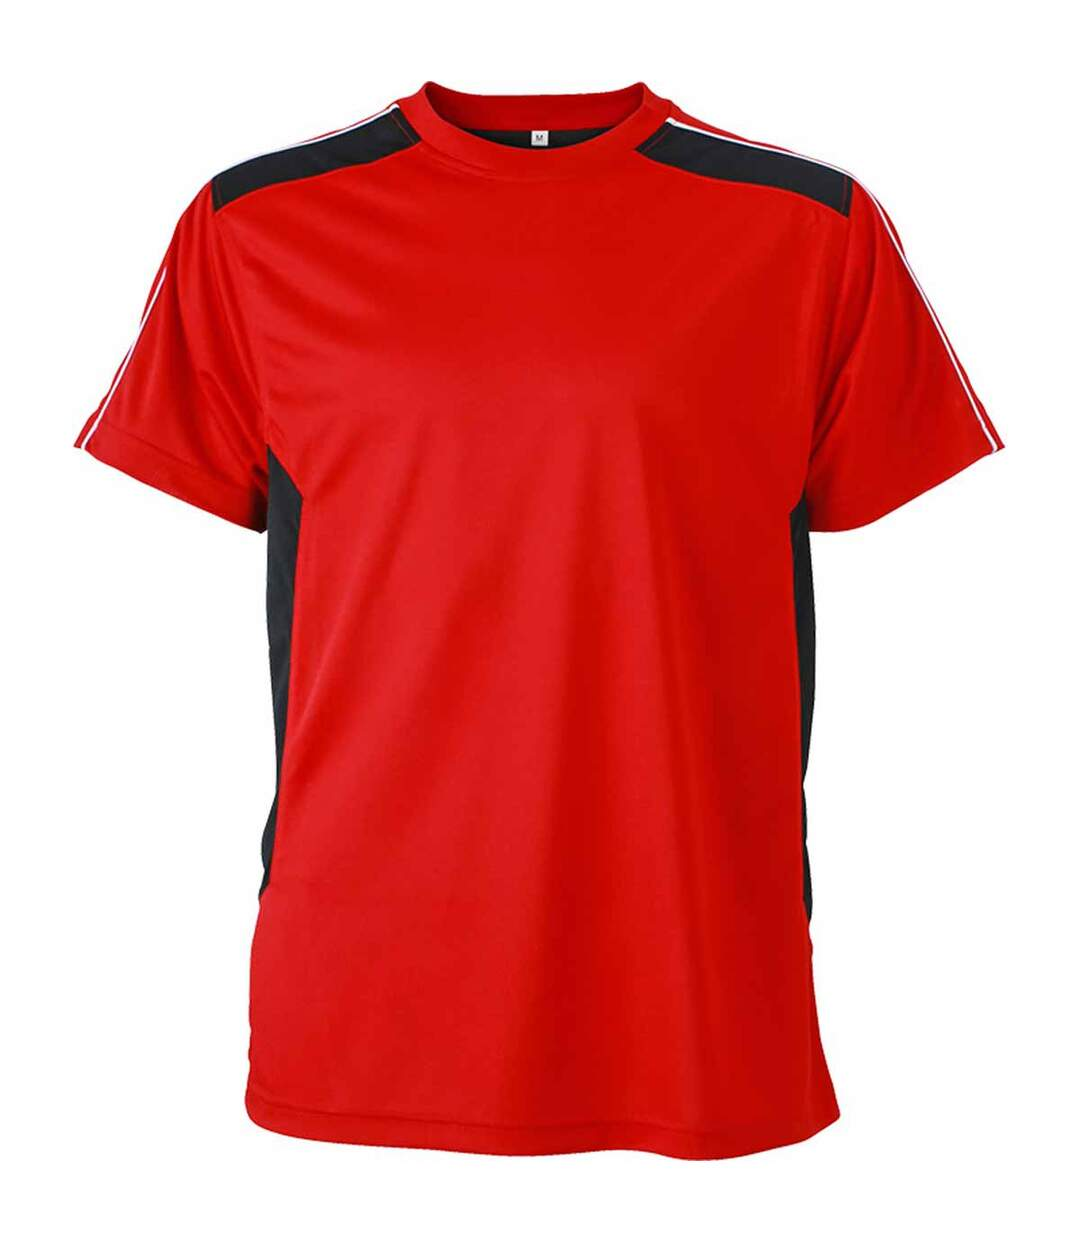 T-shirt artisan anti-bactérien anti-statique - JN827 - rouge